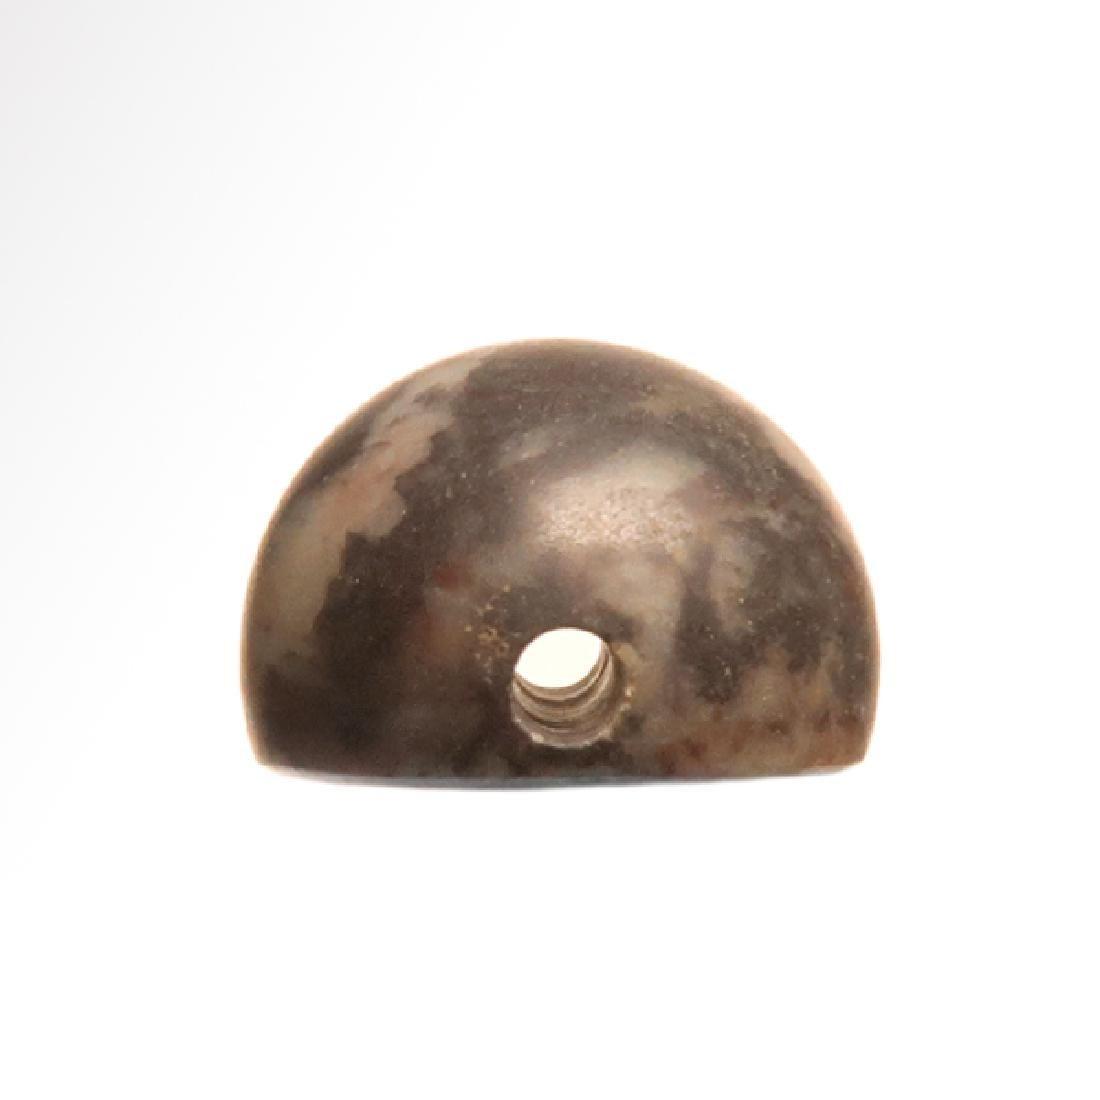 Sassanian Agate Seal, Zebu Bull, c. 200-250 A.D. - 3